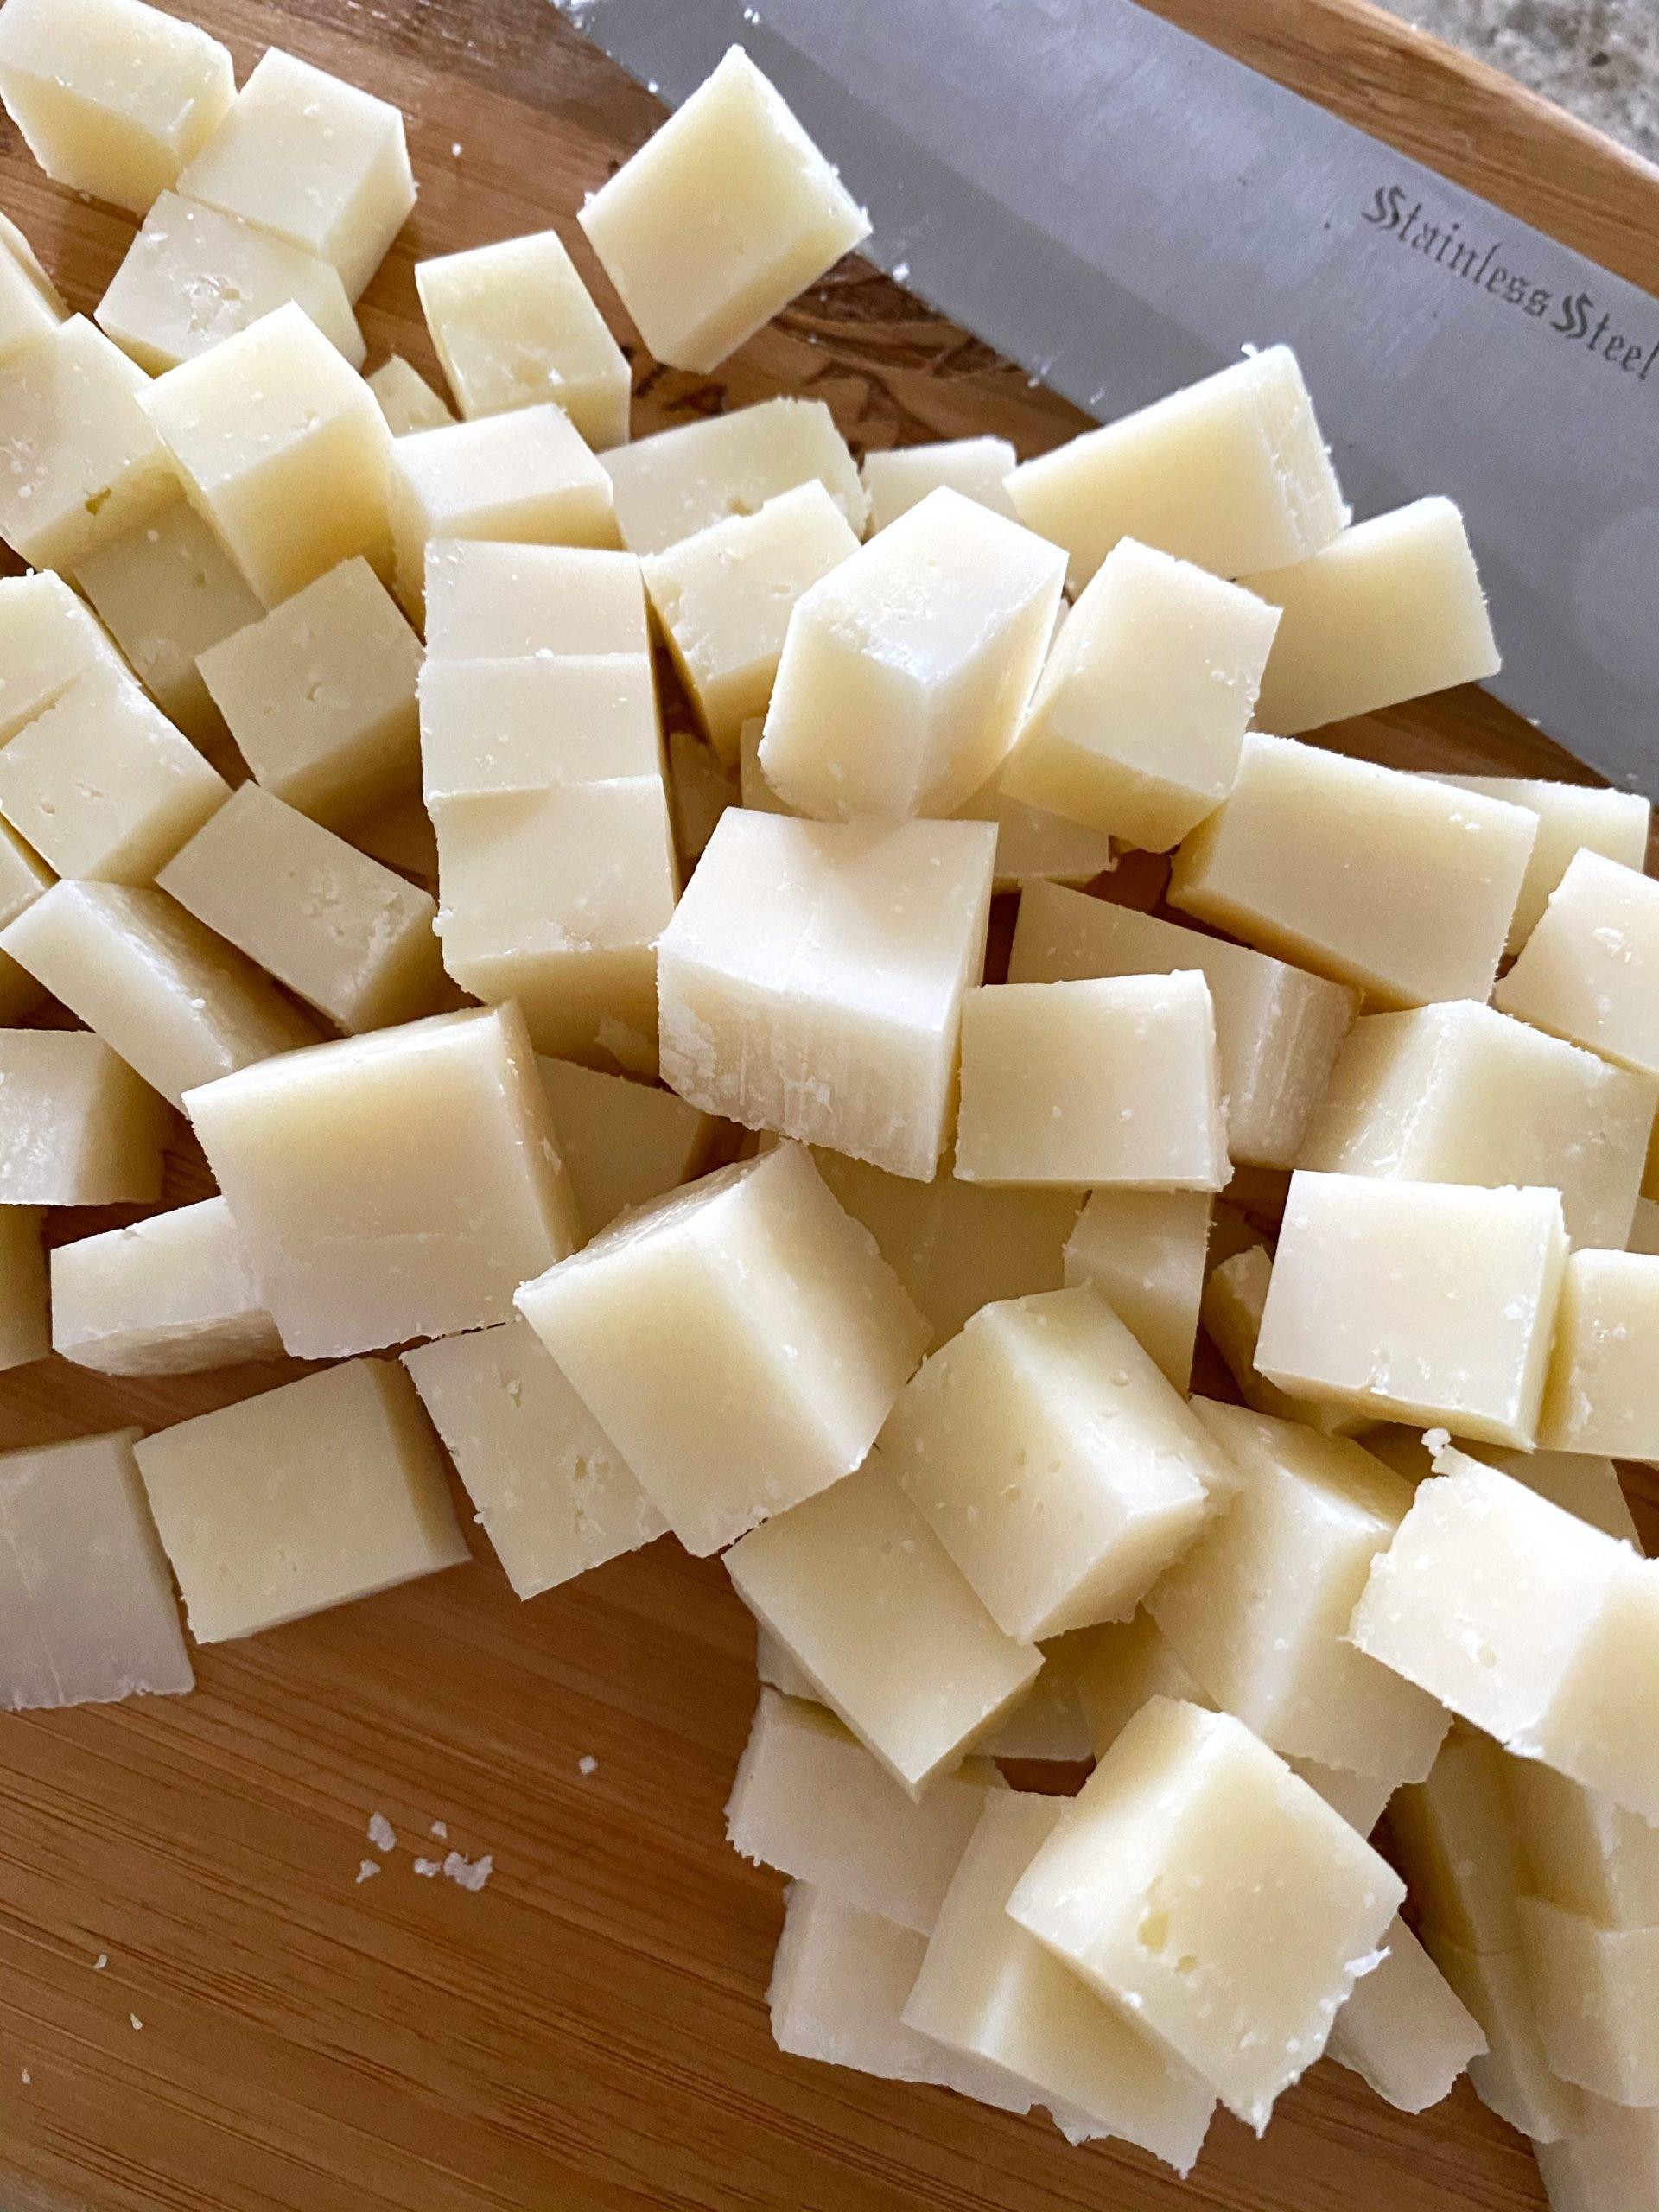 cubed pecorino Romano cheese